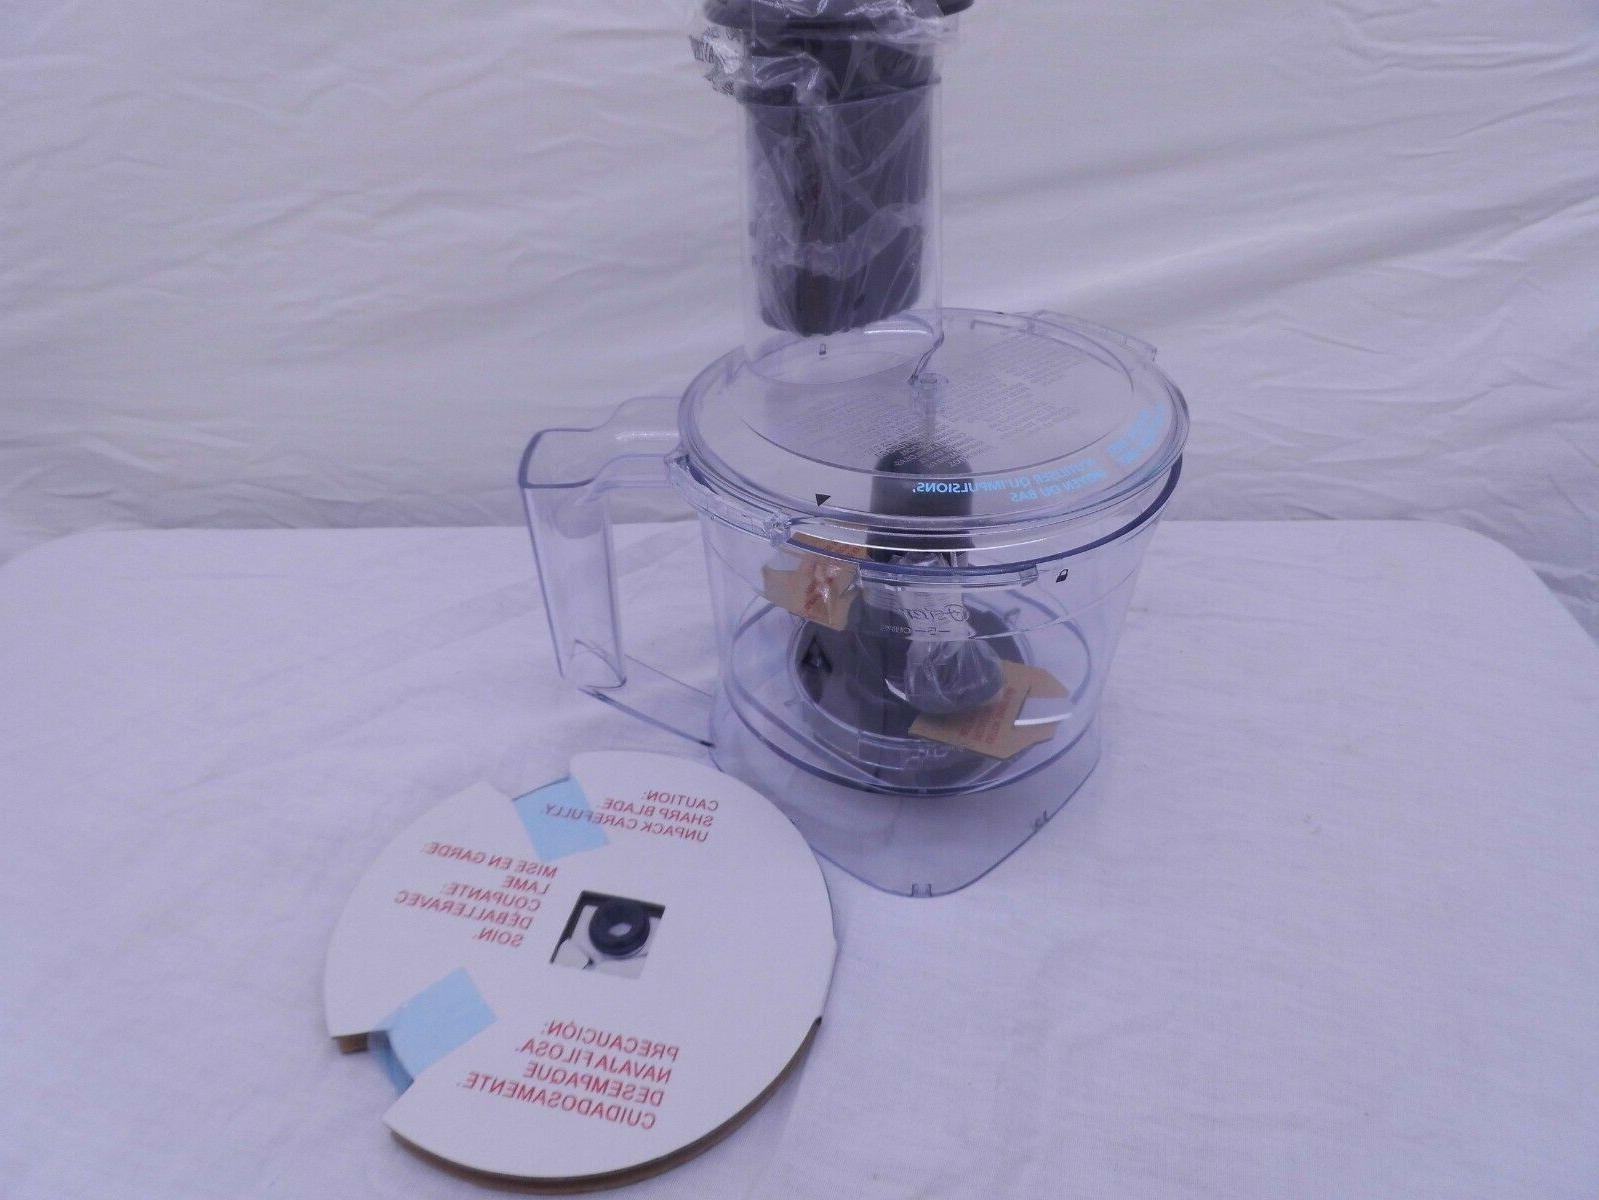 new food processor 5 cup attachment set